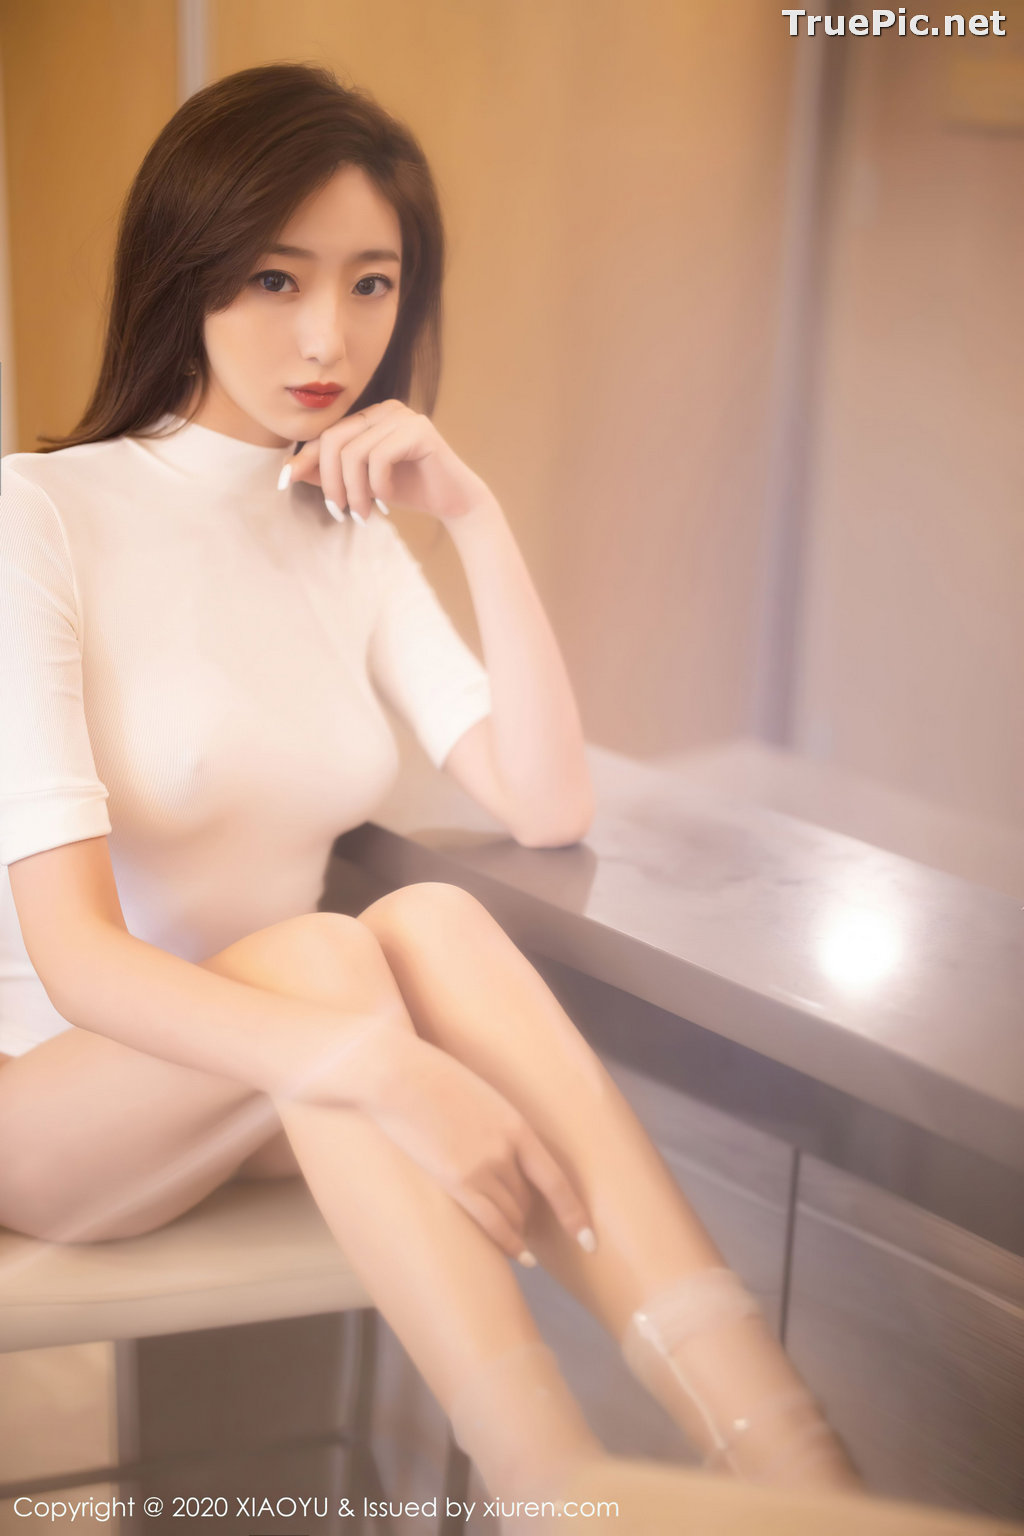 Image XiaoYu Vol.389 - Chinese Model - 安琪 Yee - Beautiful In White - TruePic.net - Picture-6